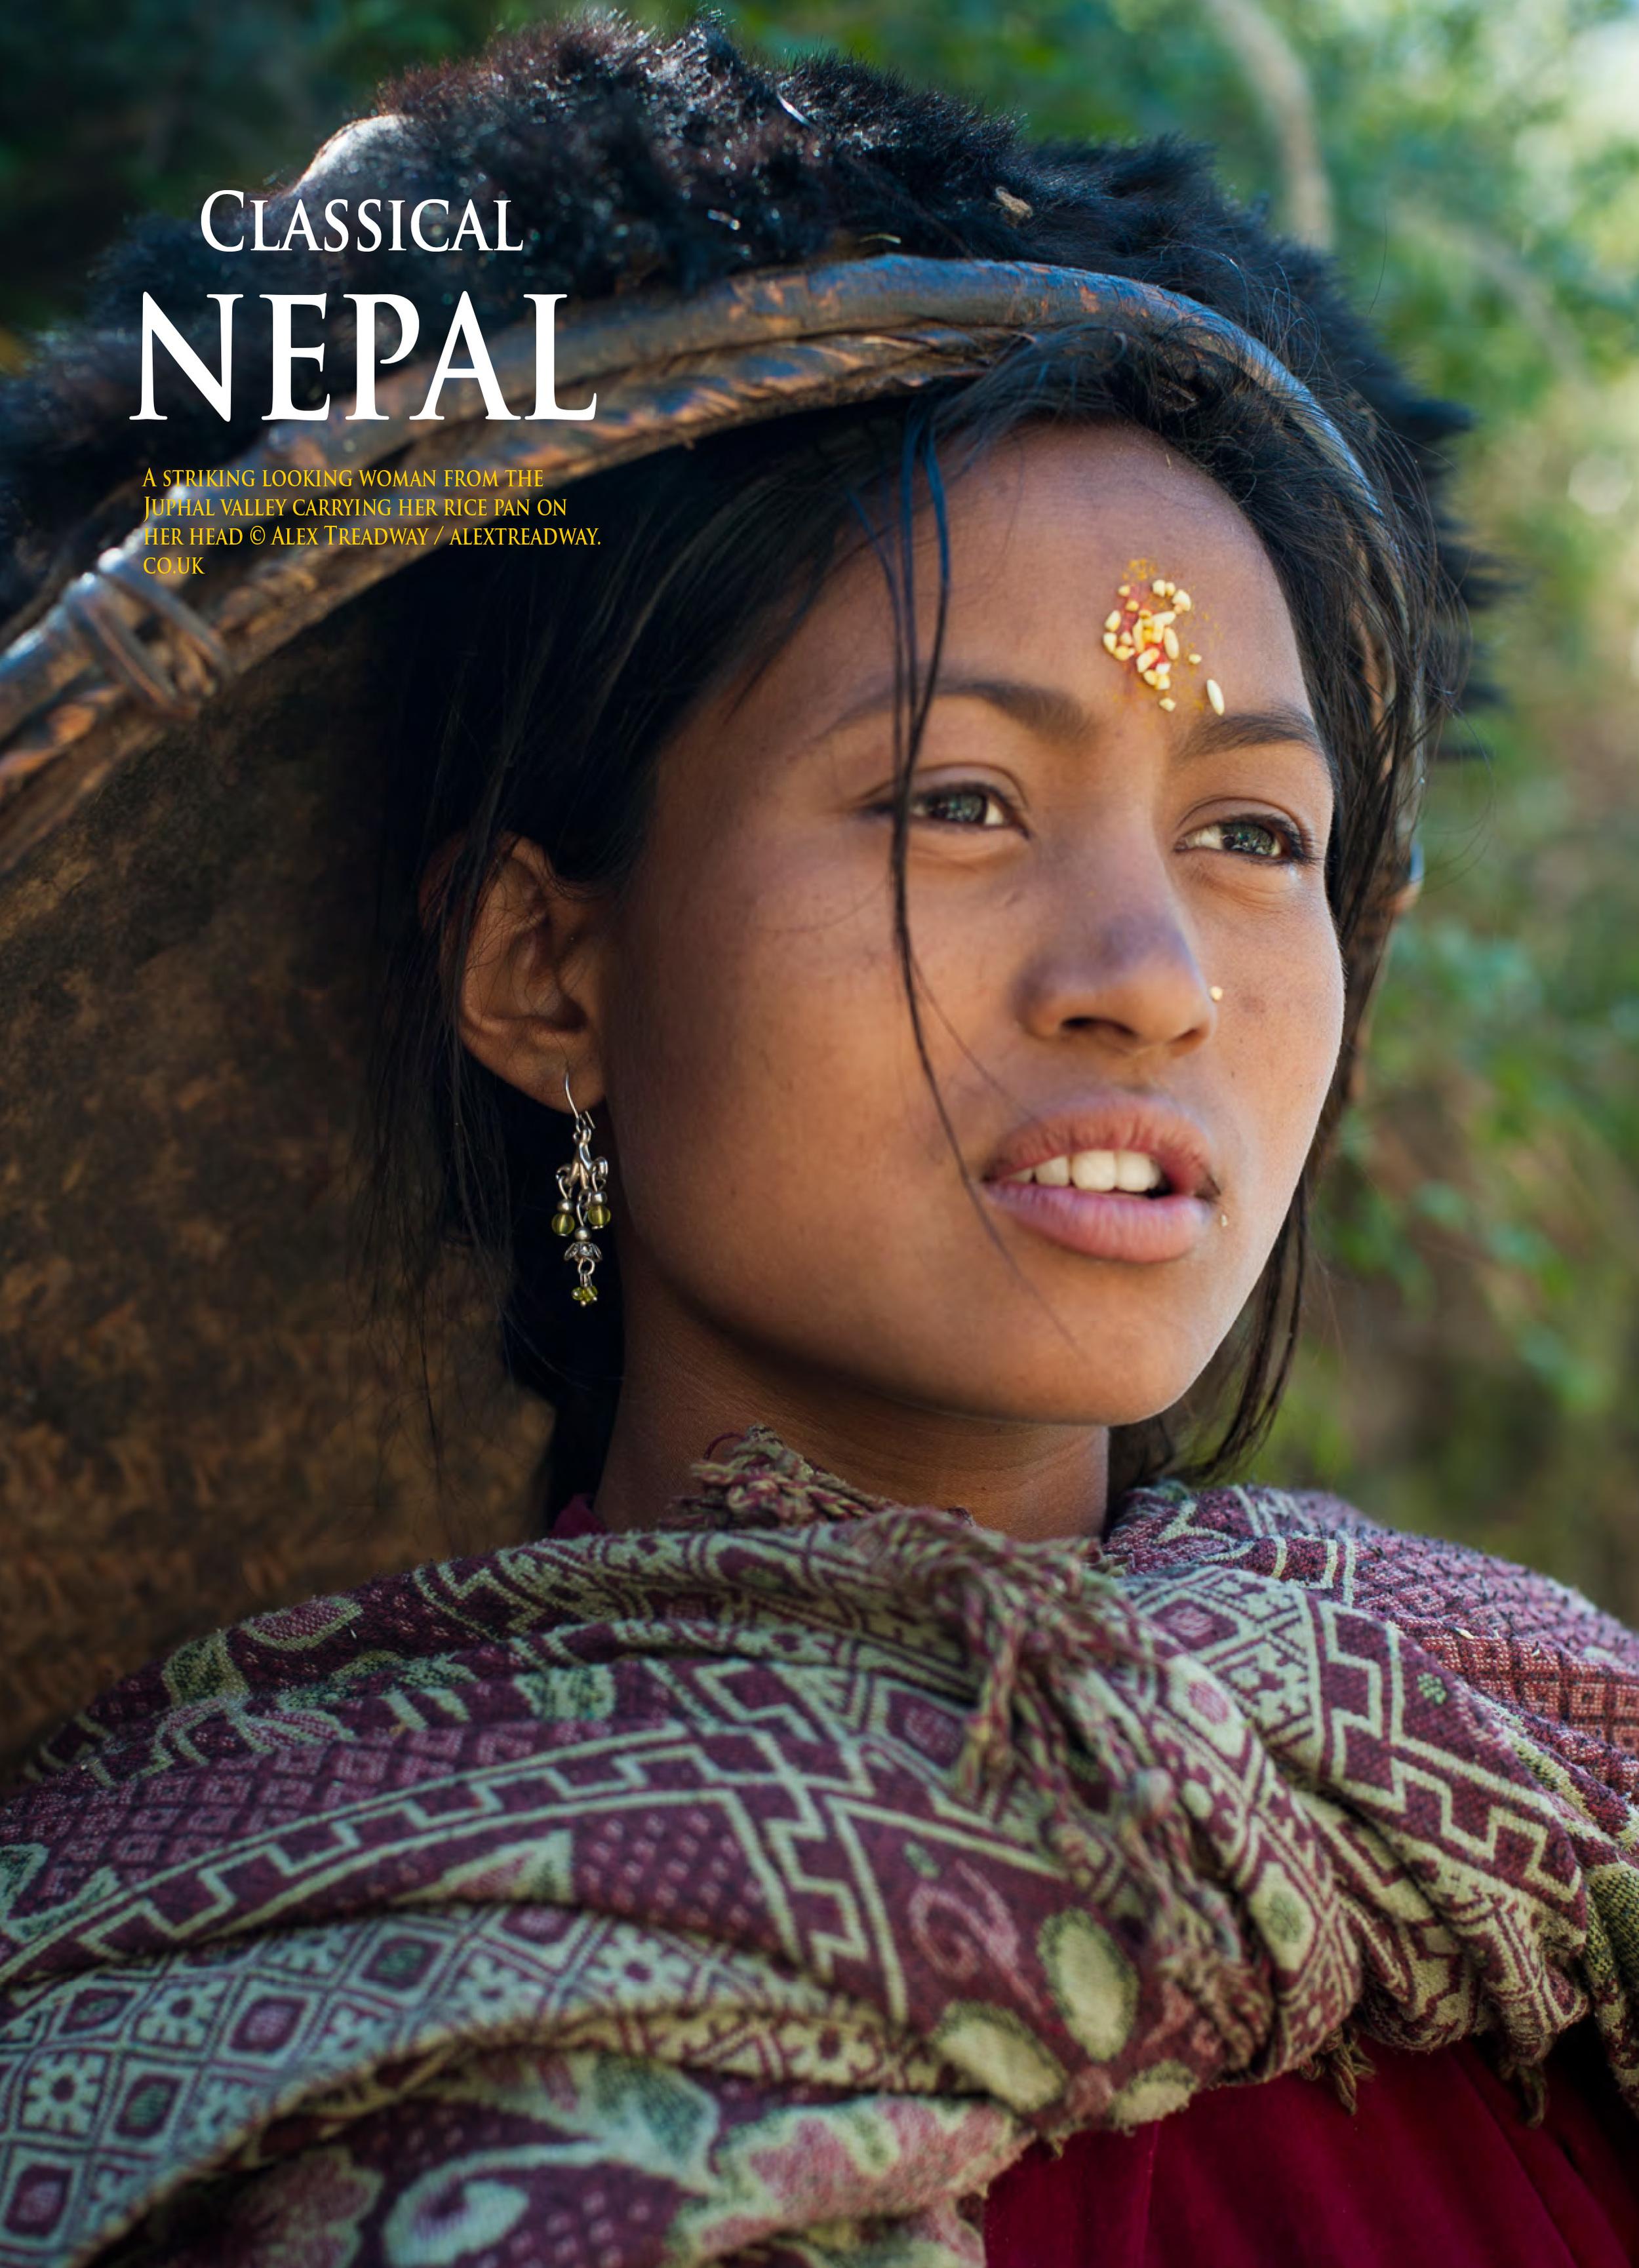 Himalayas Magazine - Classical Nepal.jpg